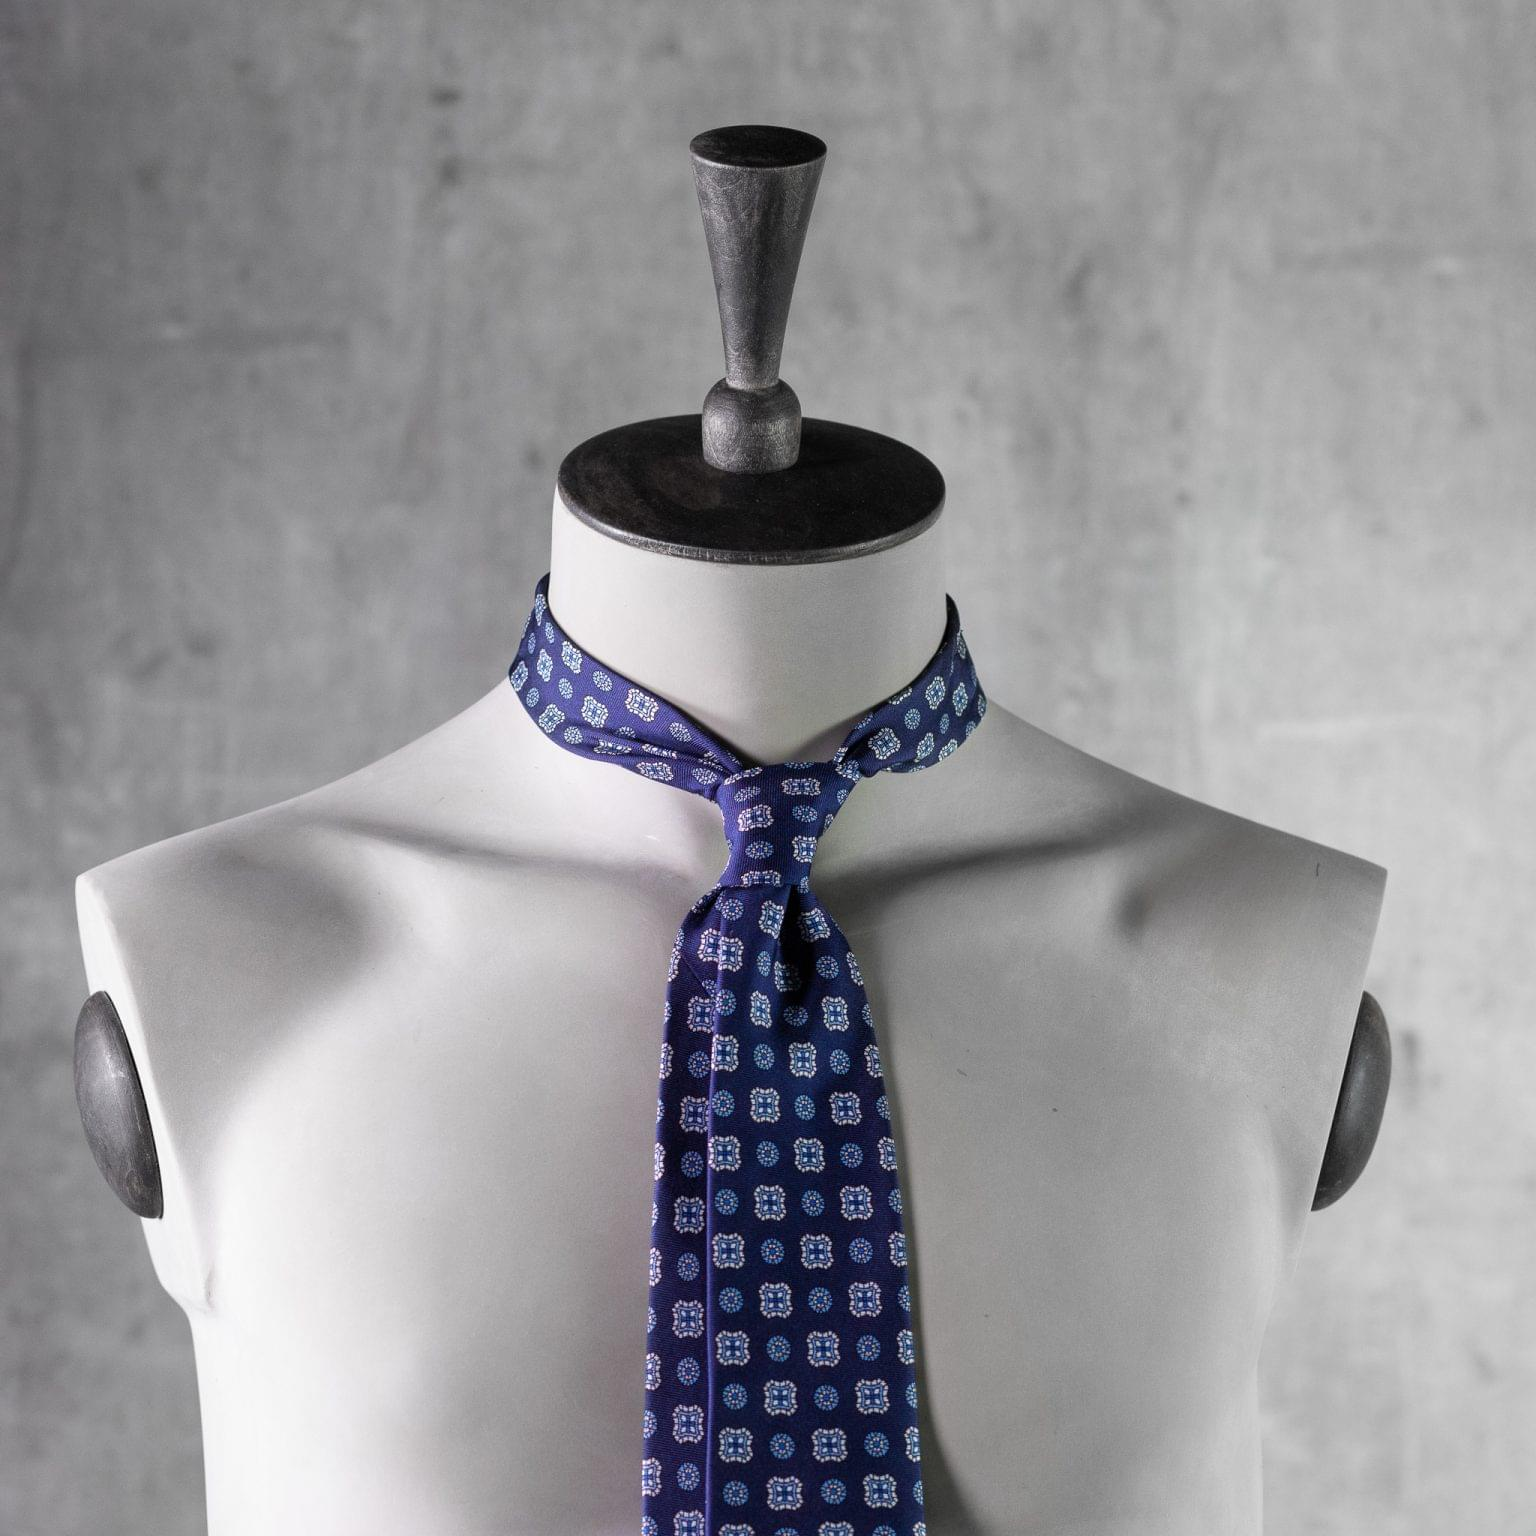 PRINTED-SILK-SEDA-ESTAMPADA-0421-Tie-Initials-Corbata-Iniciales-The-Seelk-3